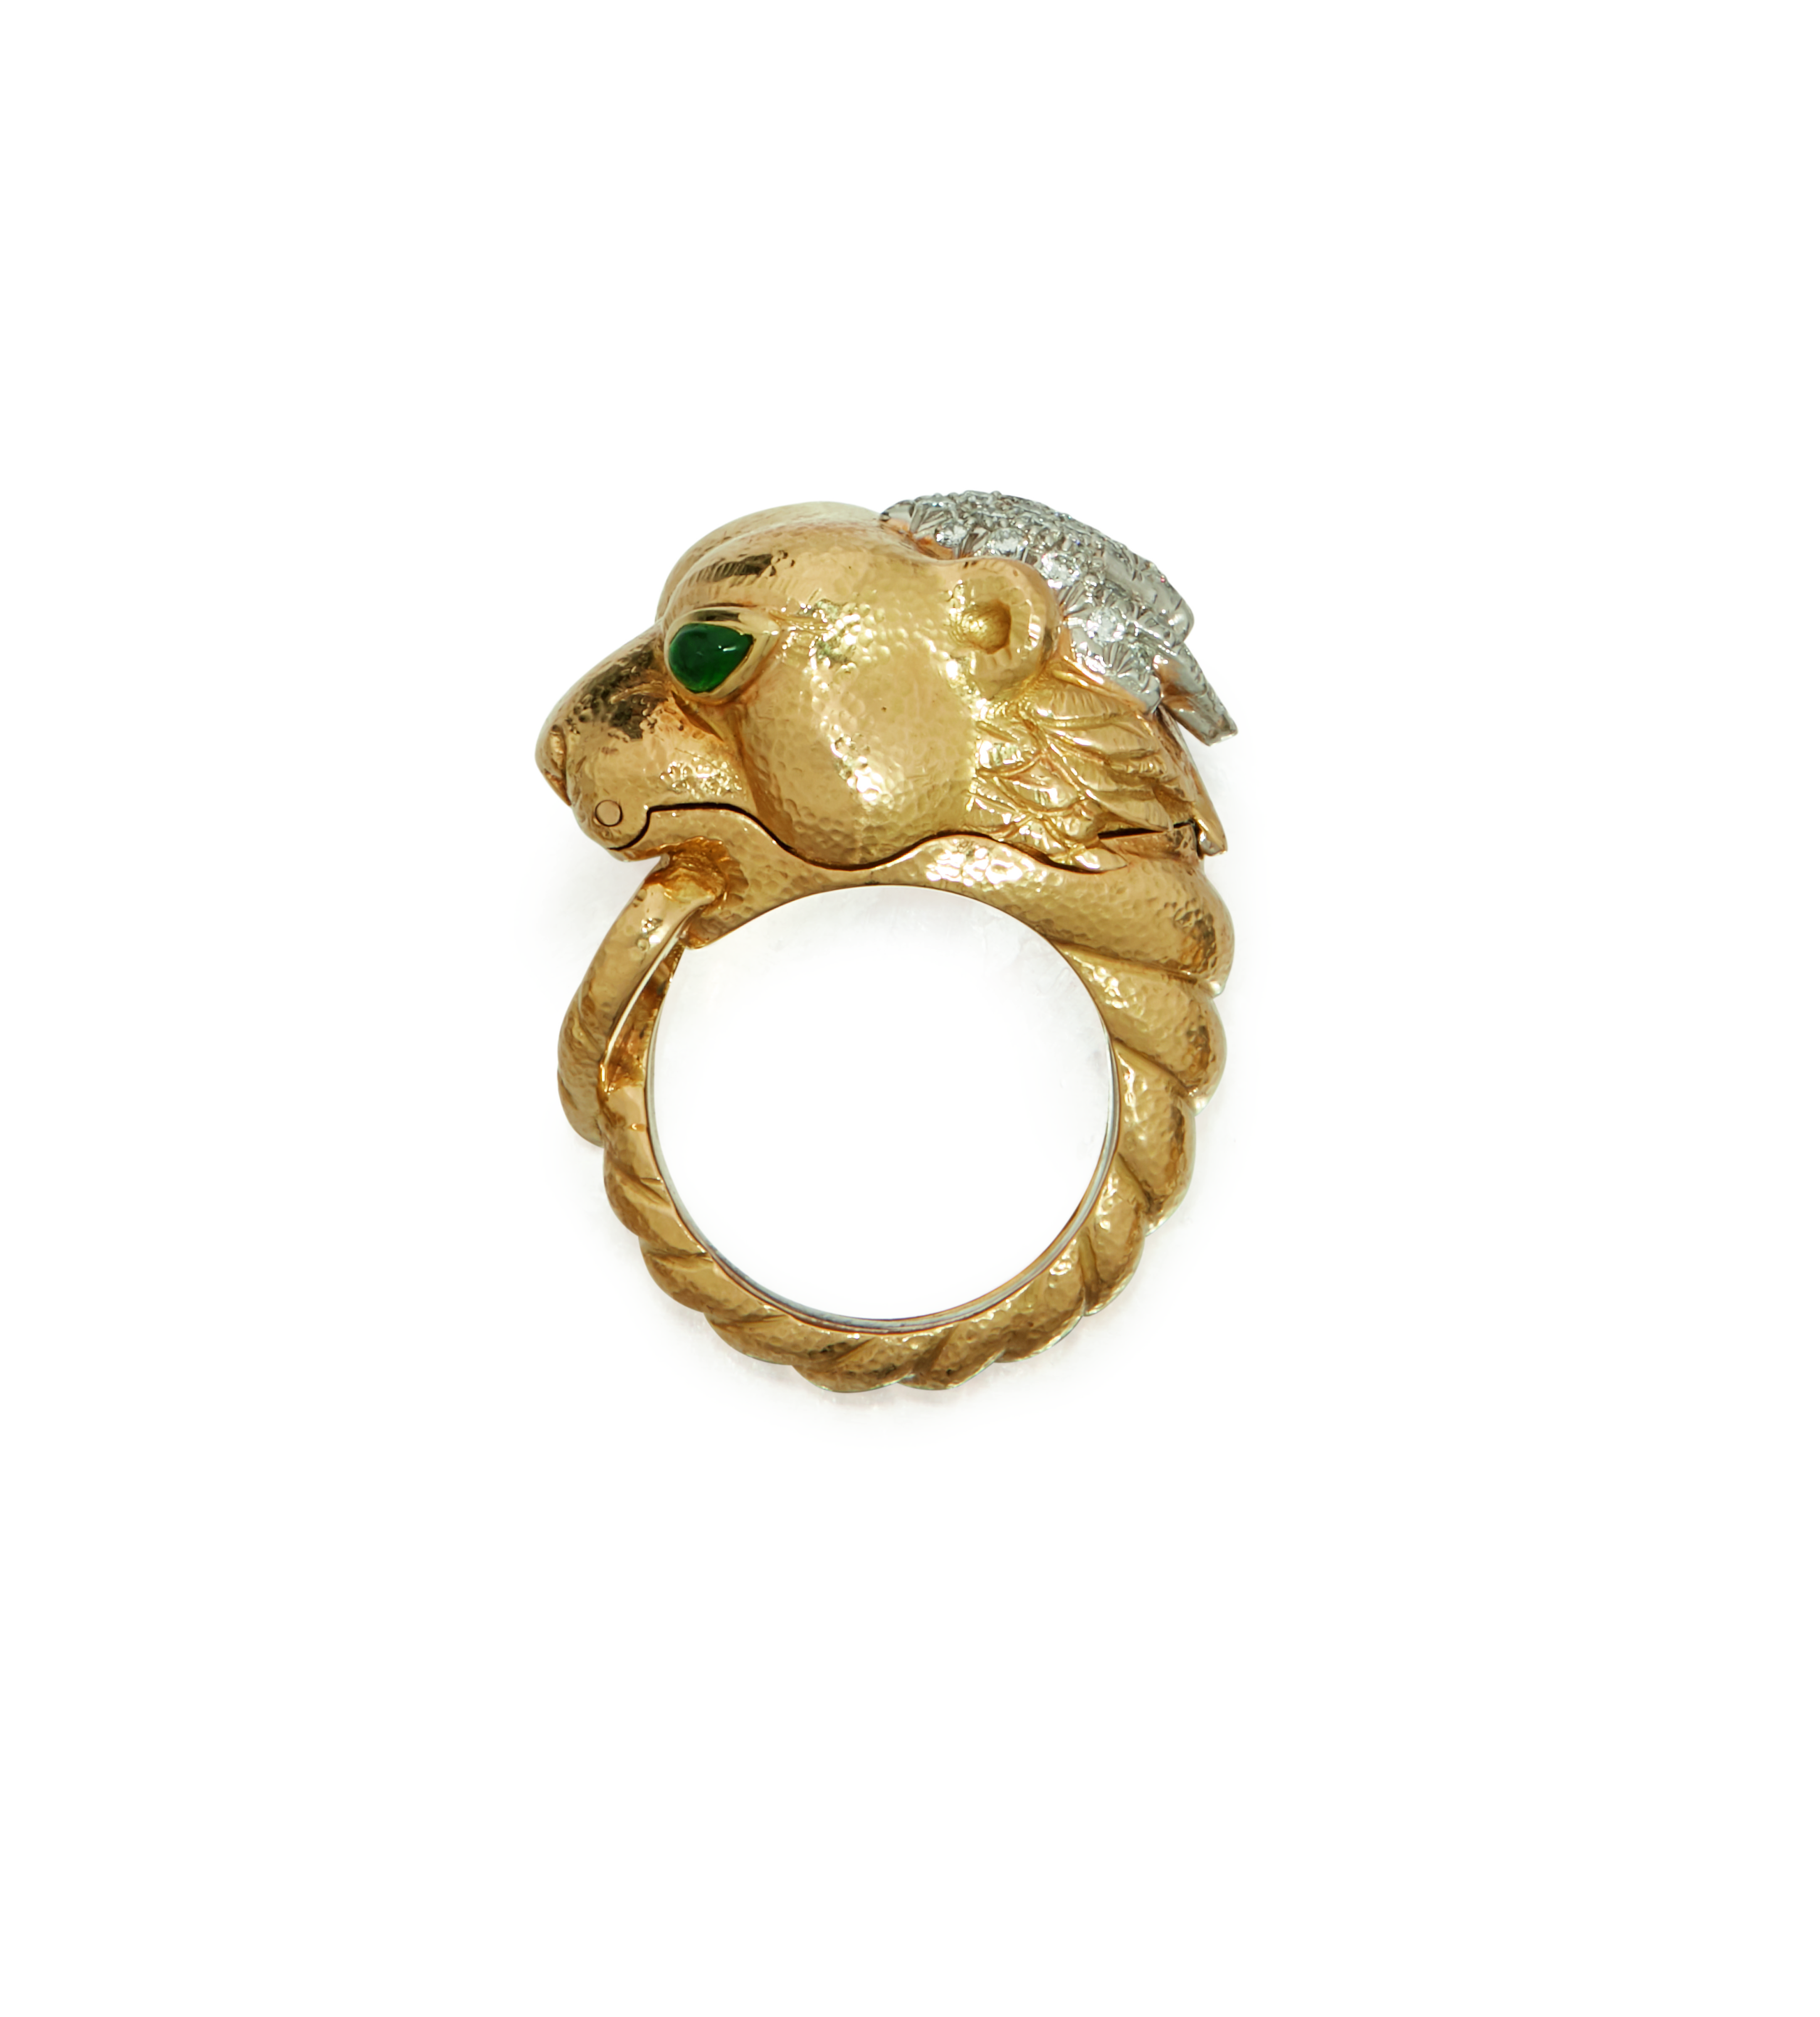 View full screen - View 1 of Lot 17. GOLD, DIAMOND AND EMERALD 'ESTÉE LAUDER LION' RING, DAVID WEBB.